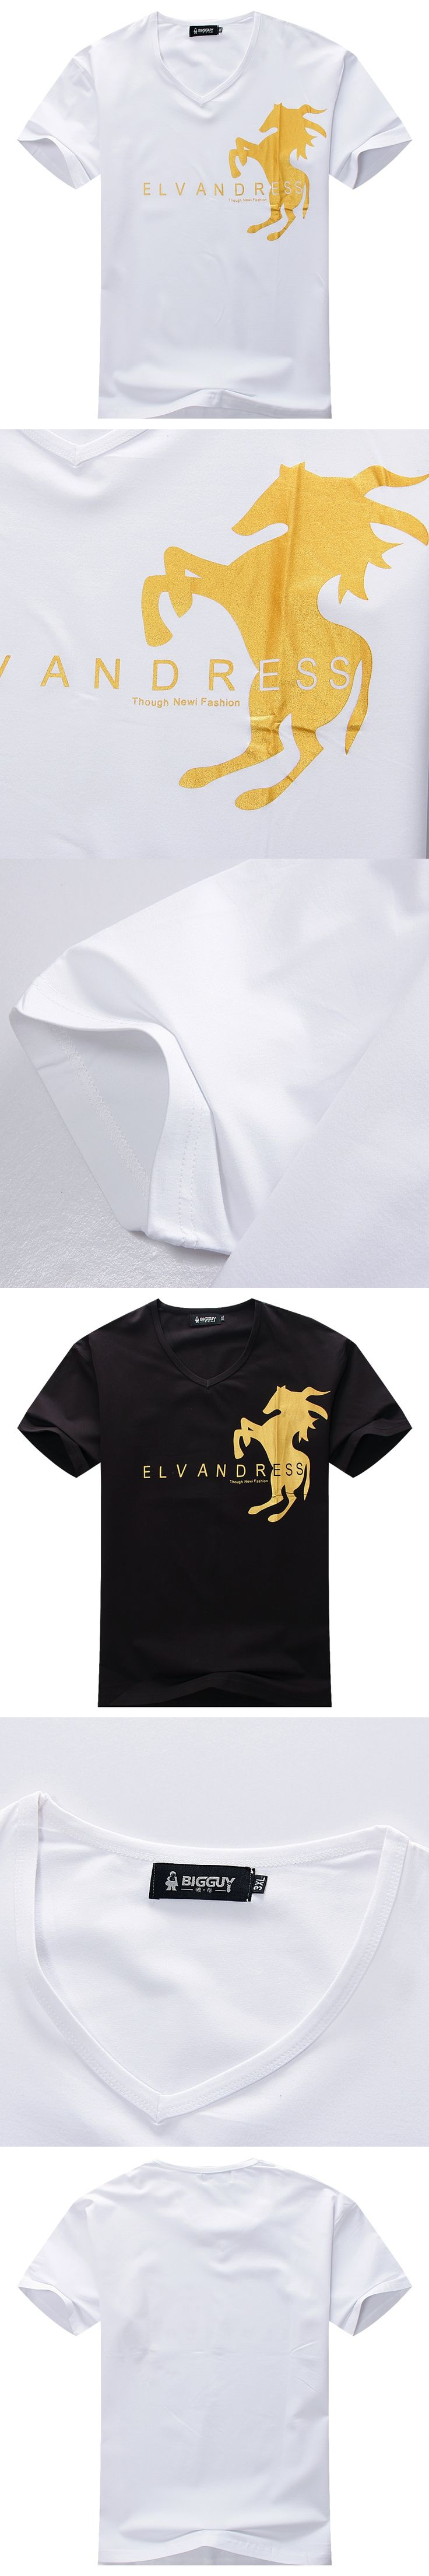 BIG SALE 2017 New Hot Plus size 8XL 7XL 6XL 5XL 4XL Mens T Shirt Men Summer Fashion Slim V-Neck Short Sleeve T Shirts Men cotton